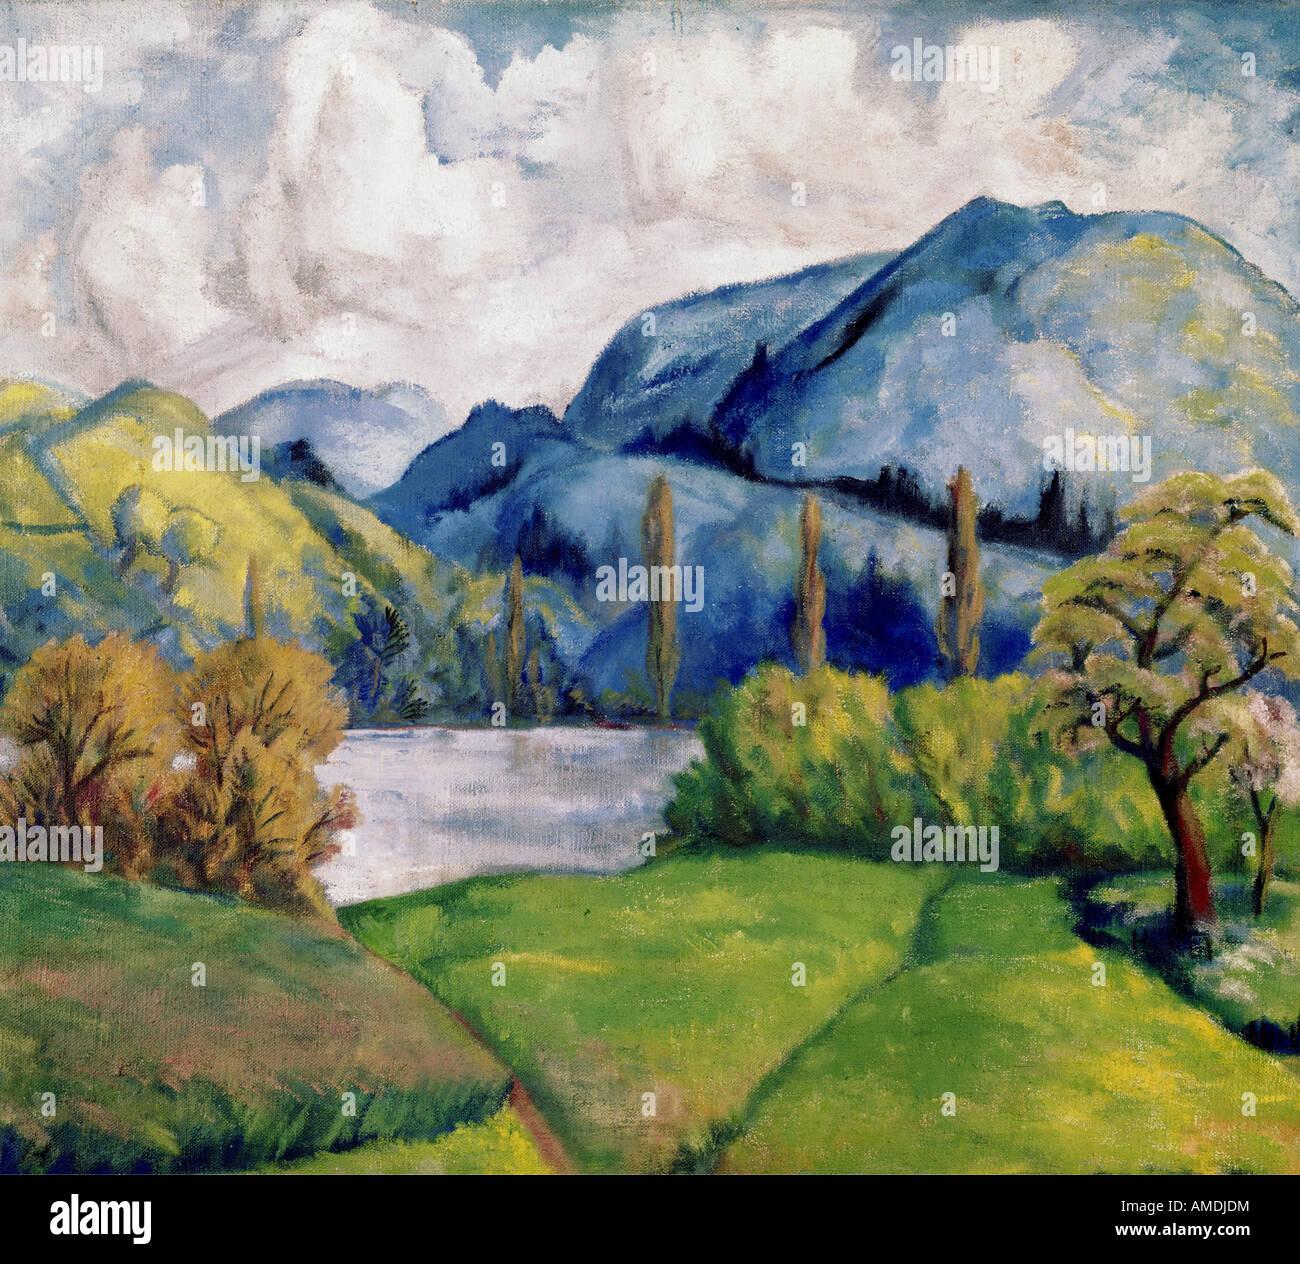 Belas artes, Cézanne, Paulo, (1839 - 1906), pintura, Kunsthaus Zürich, Francês, impressionsm, natureza, Imagens de Stock